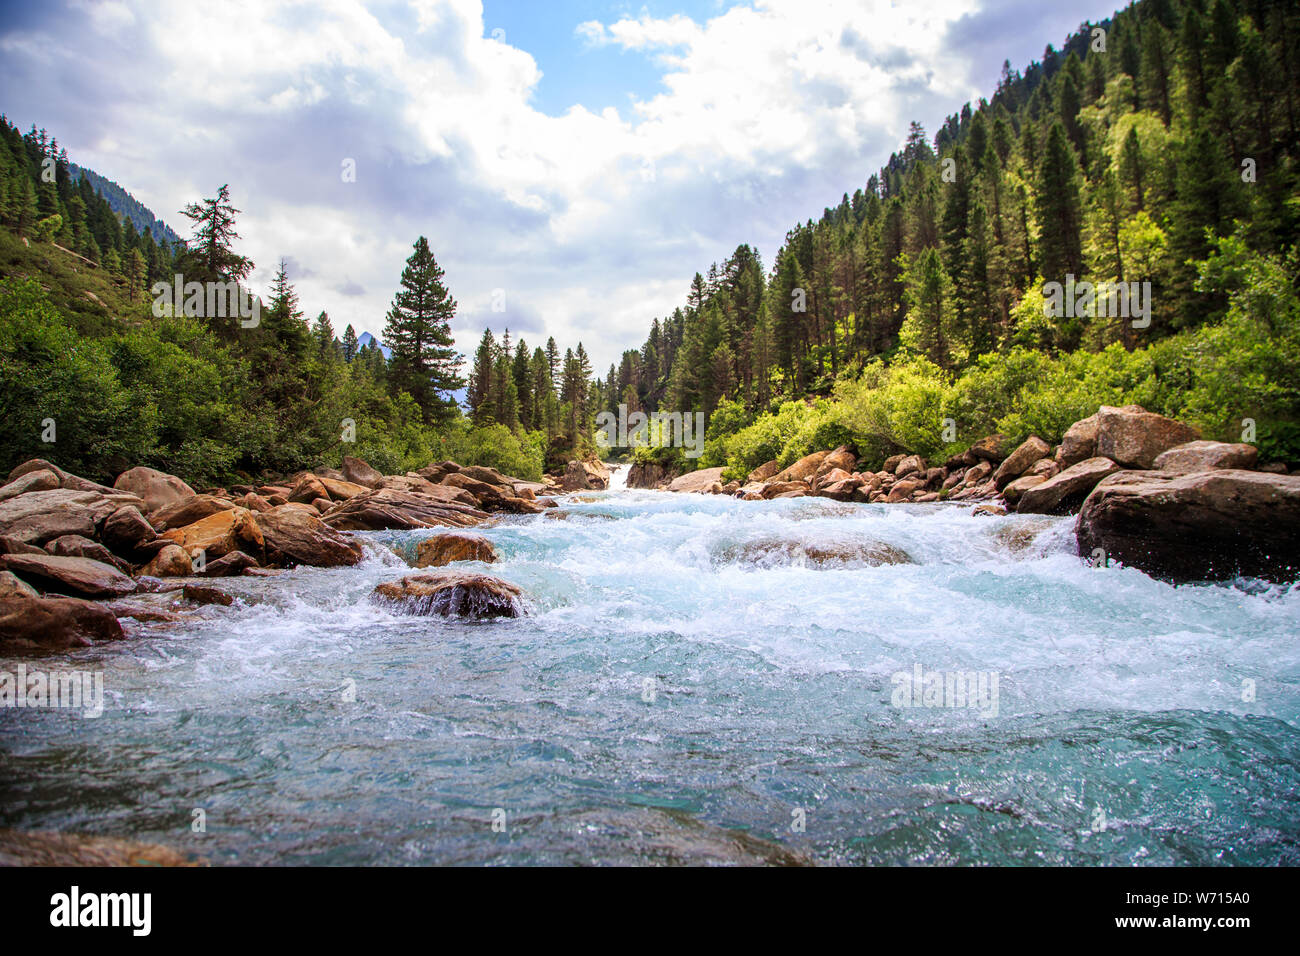 The Krimmler Ache river in the High Tauern , Austria Stock Photo